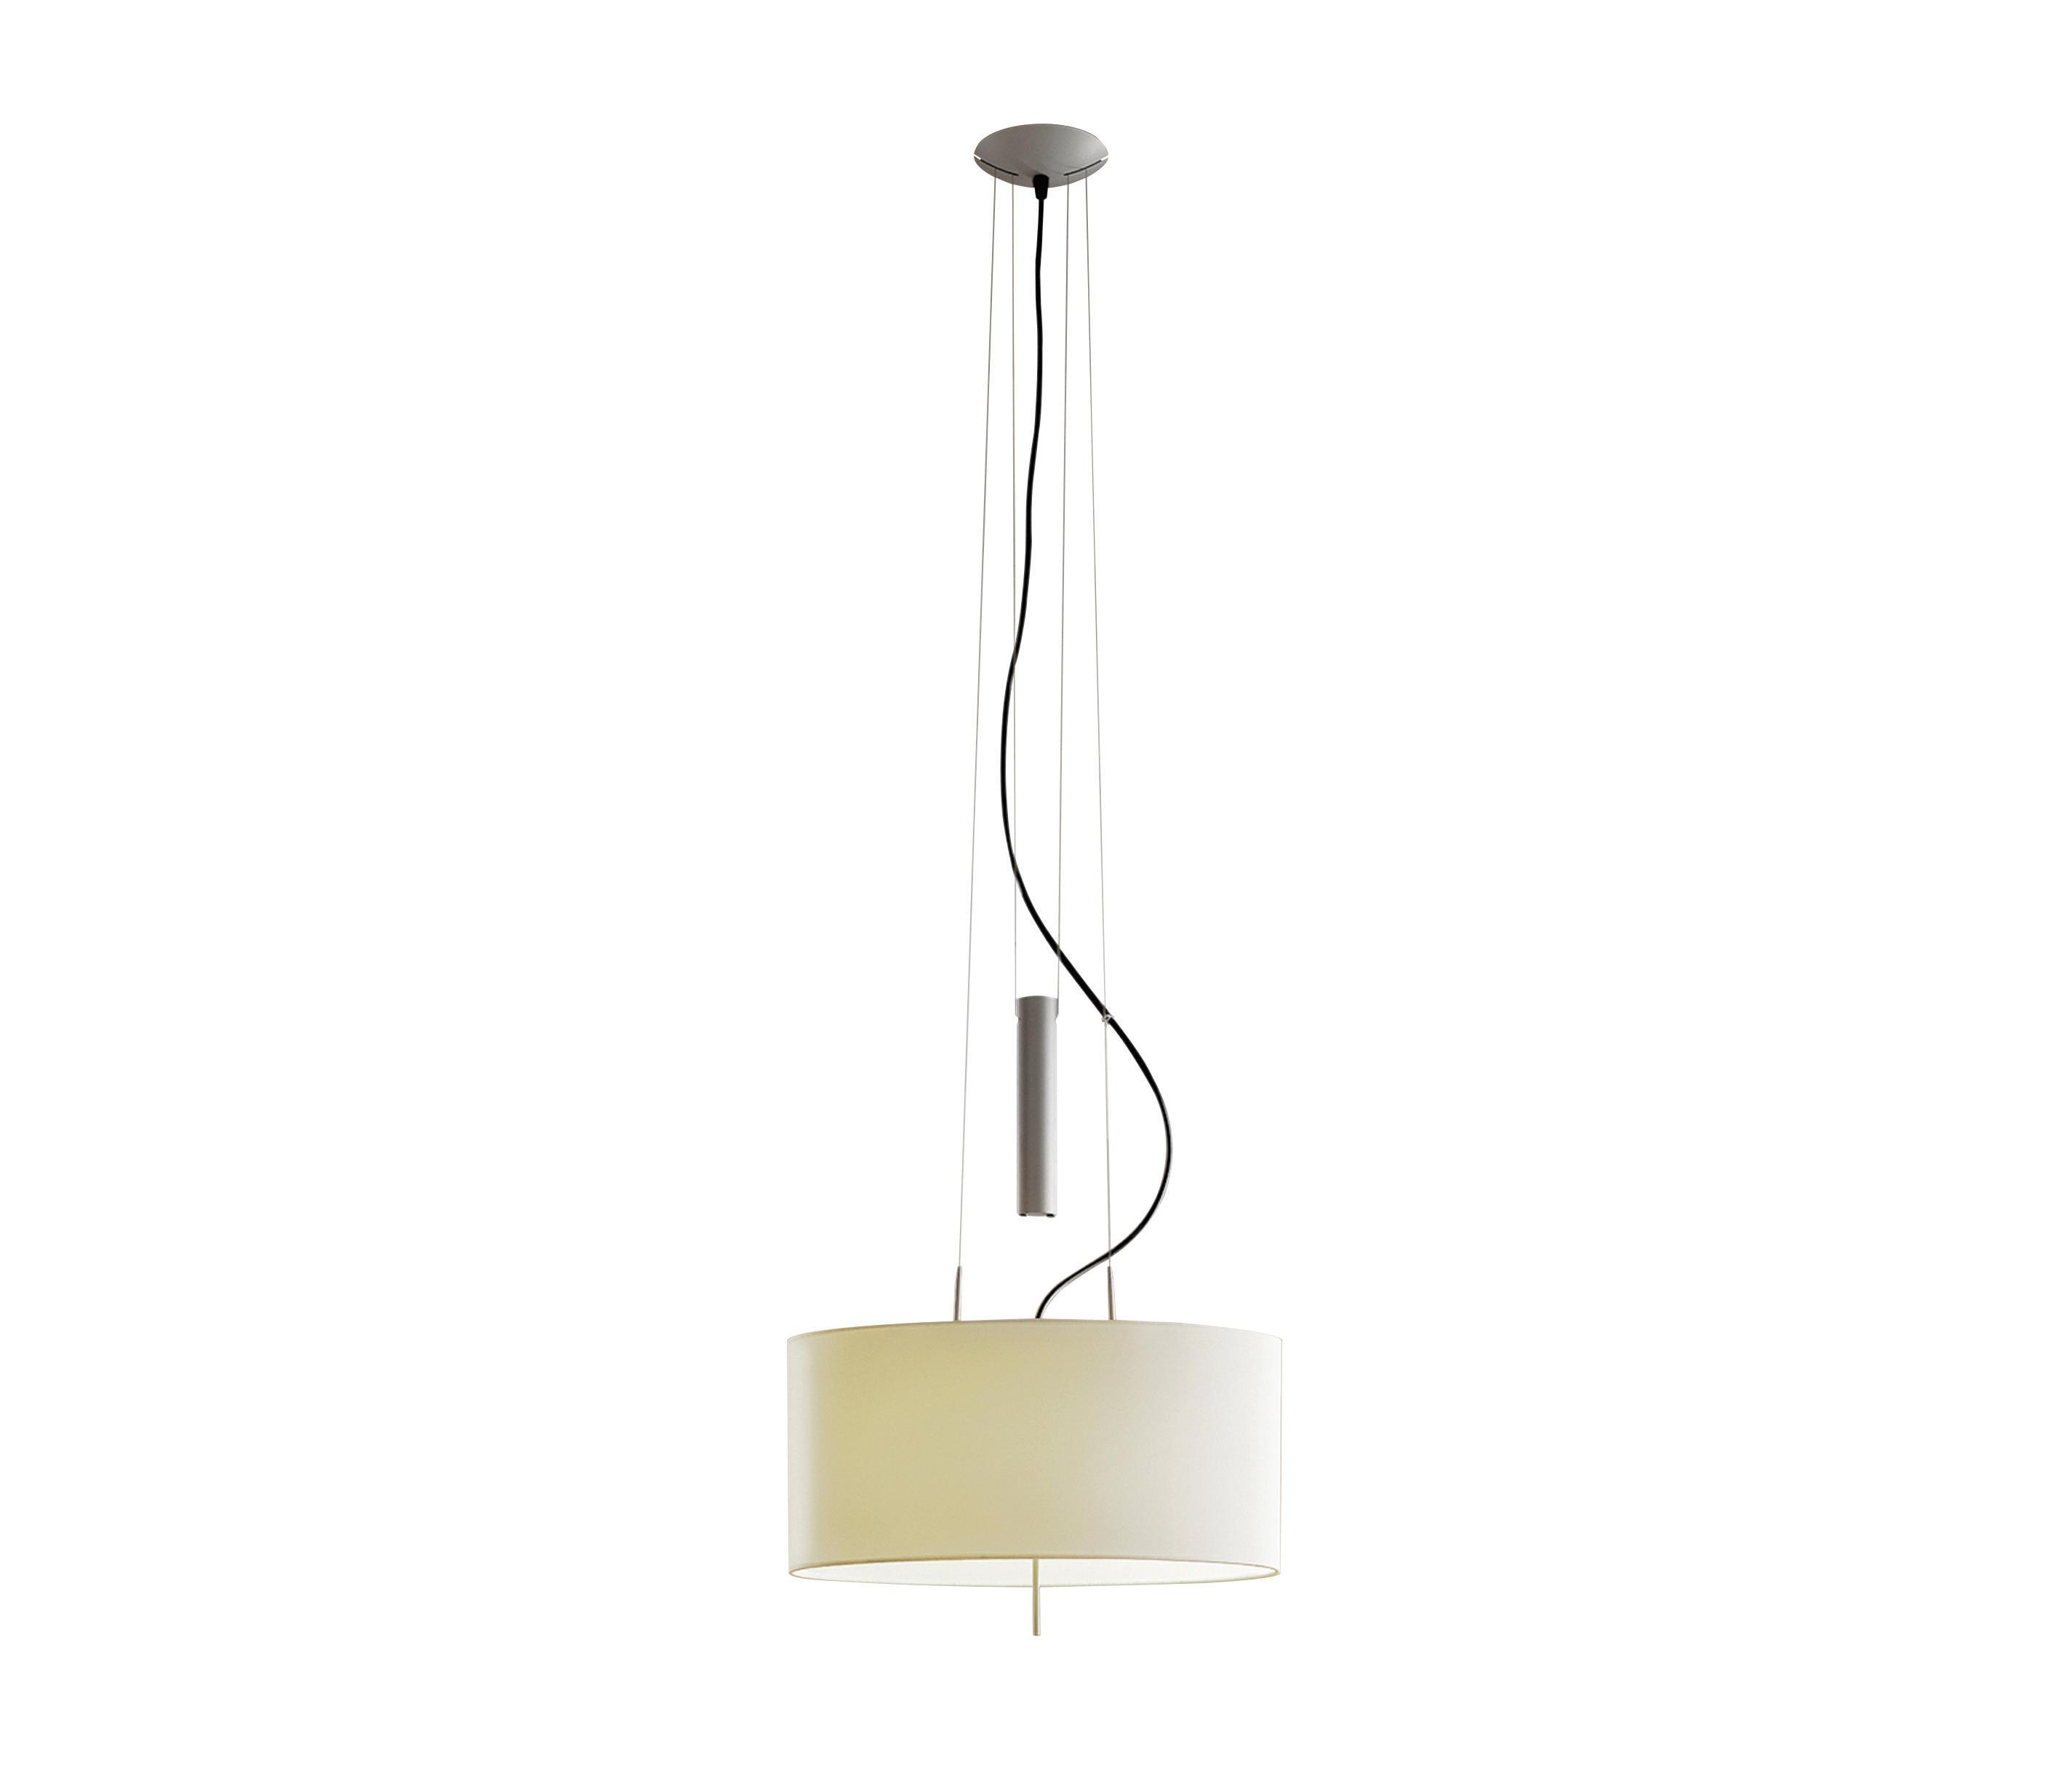 Funi Pendant Lamp 60cm E27 2x100W metallic lead white lampshade